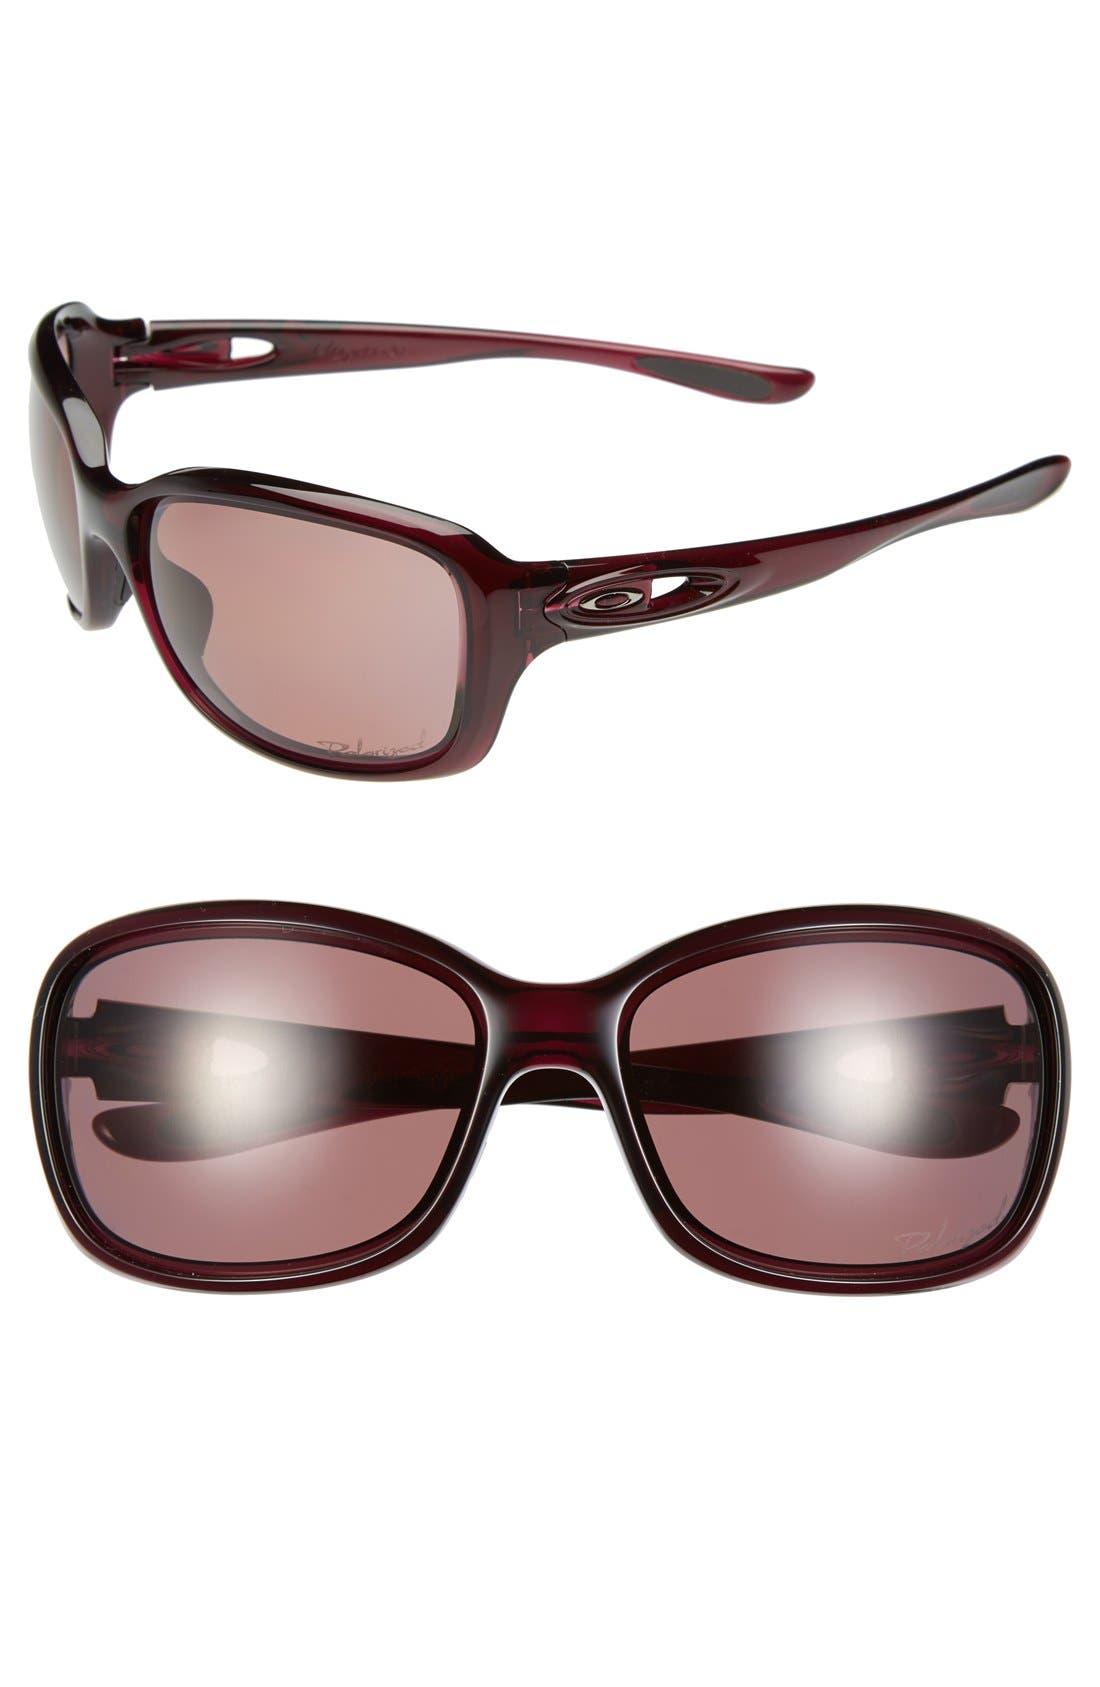 Main Image - Oakley 'Urgency' 61mm Polarized Sunglasses